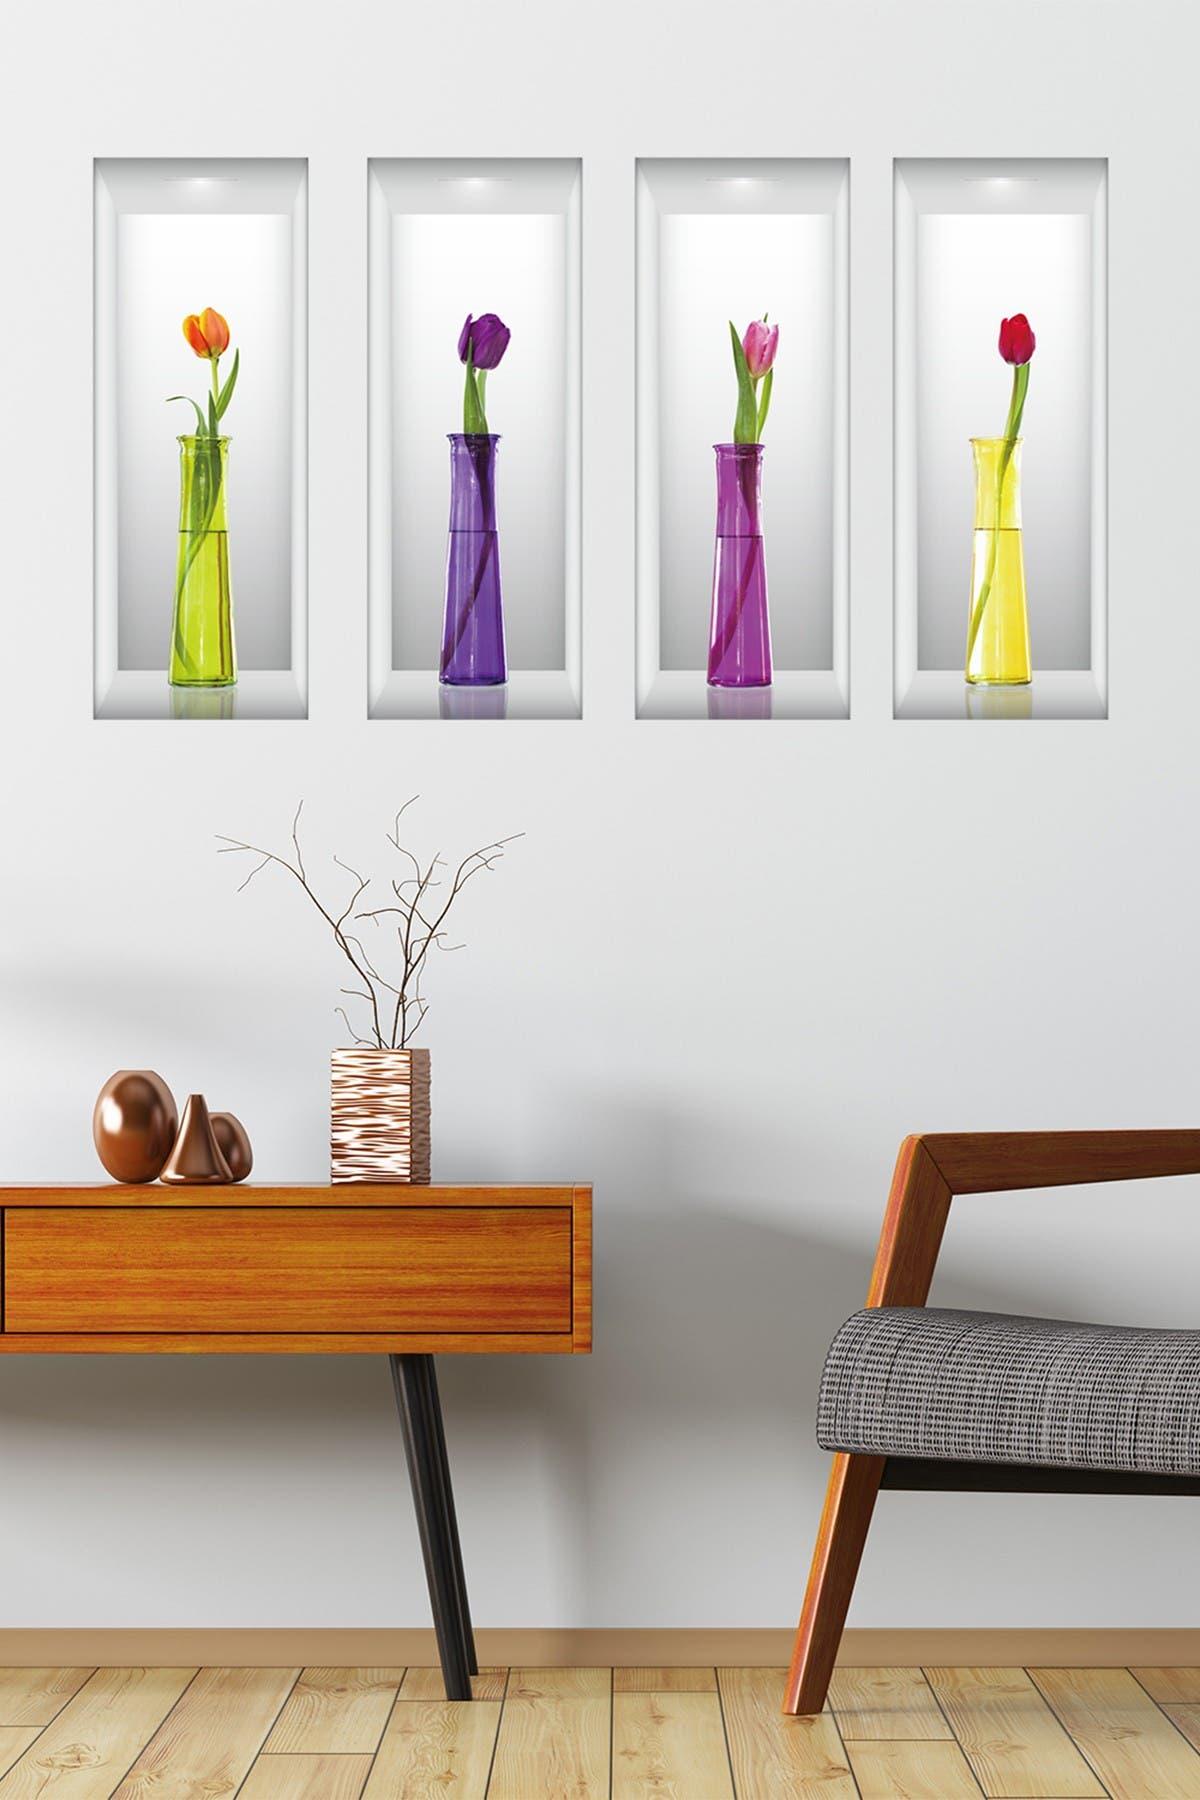 Image of WalPlus 3D Tulip Decal